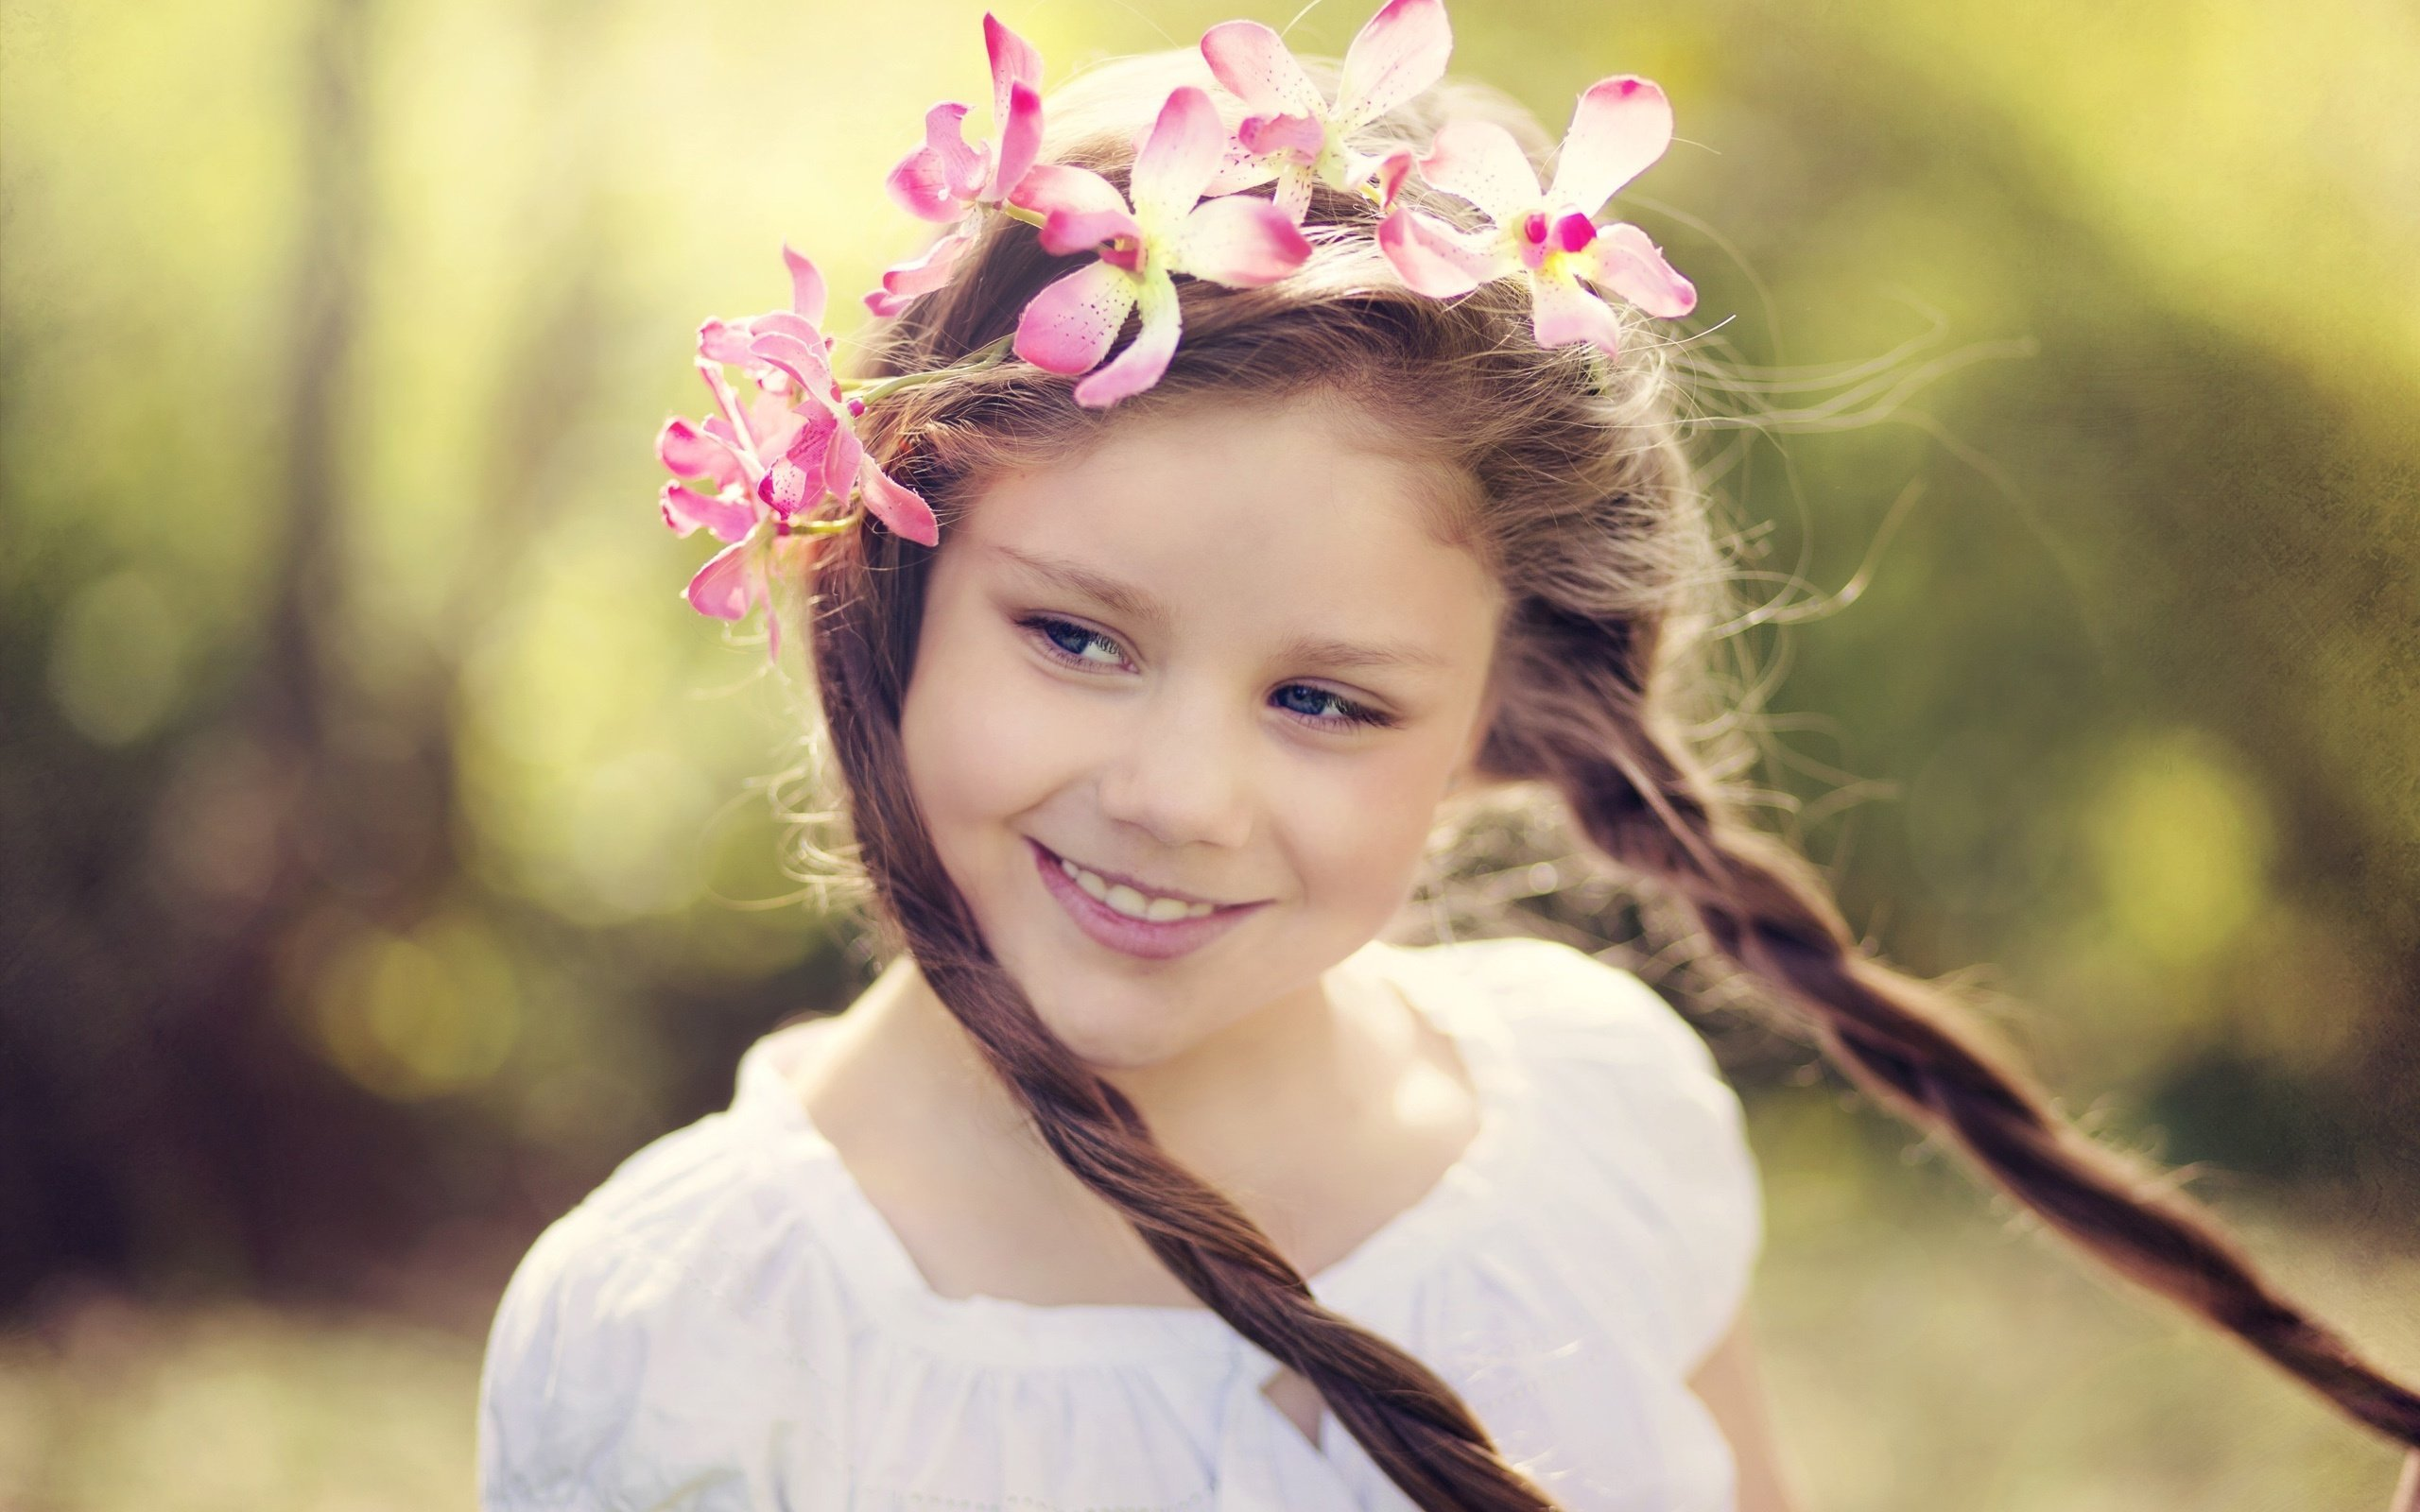 Smile little girl flower wreath Wallpaper Photo Wallpapers 2560x1600